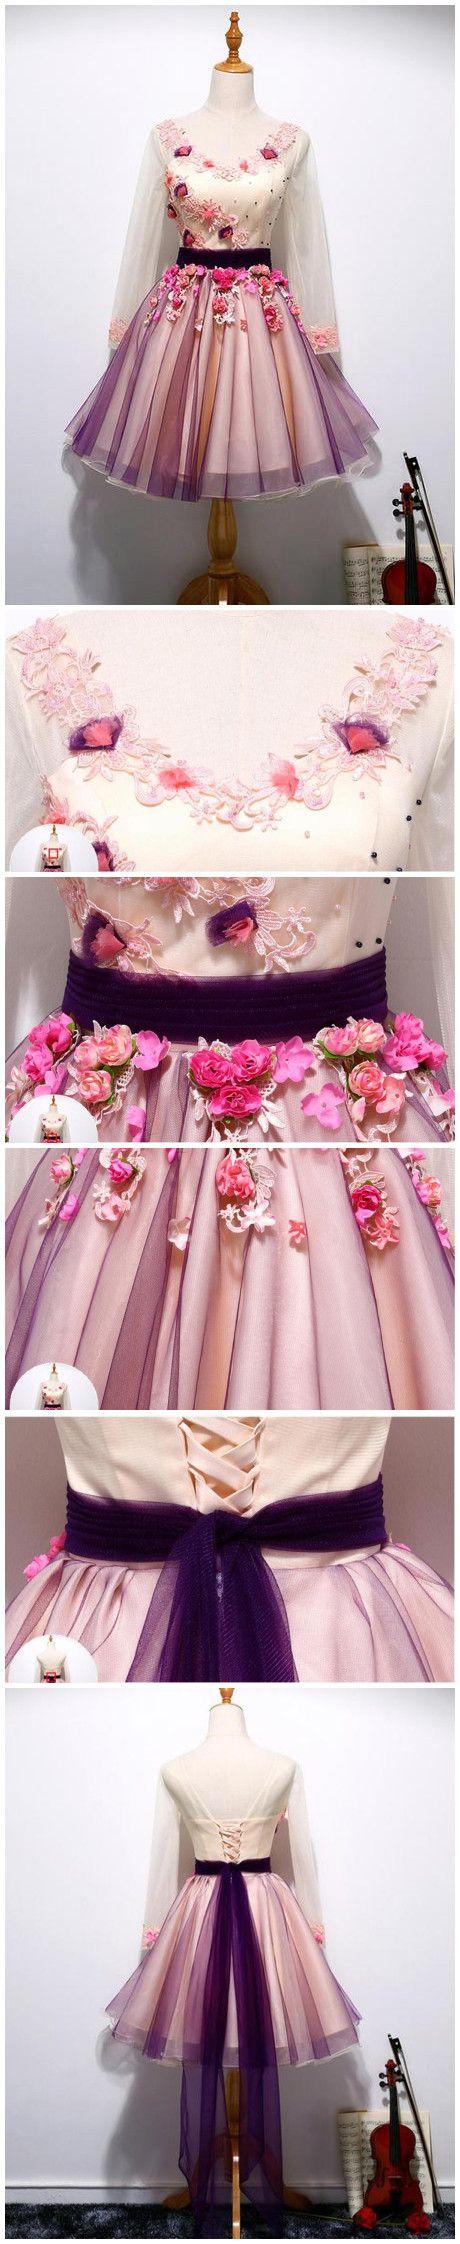 Charming Homecoming Dress,Hot Sale A-line V-neck Long Sleeve Short Prom Dress Formal Dress On Sale